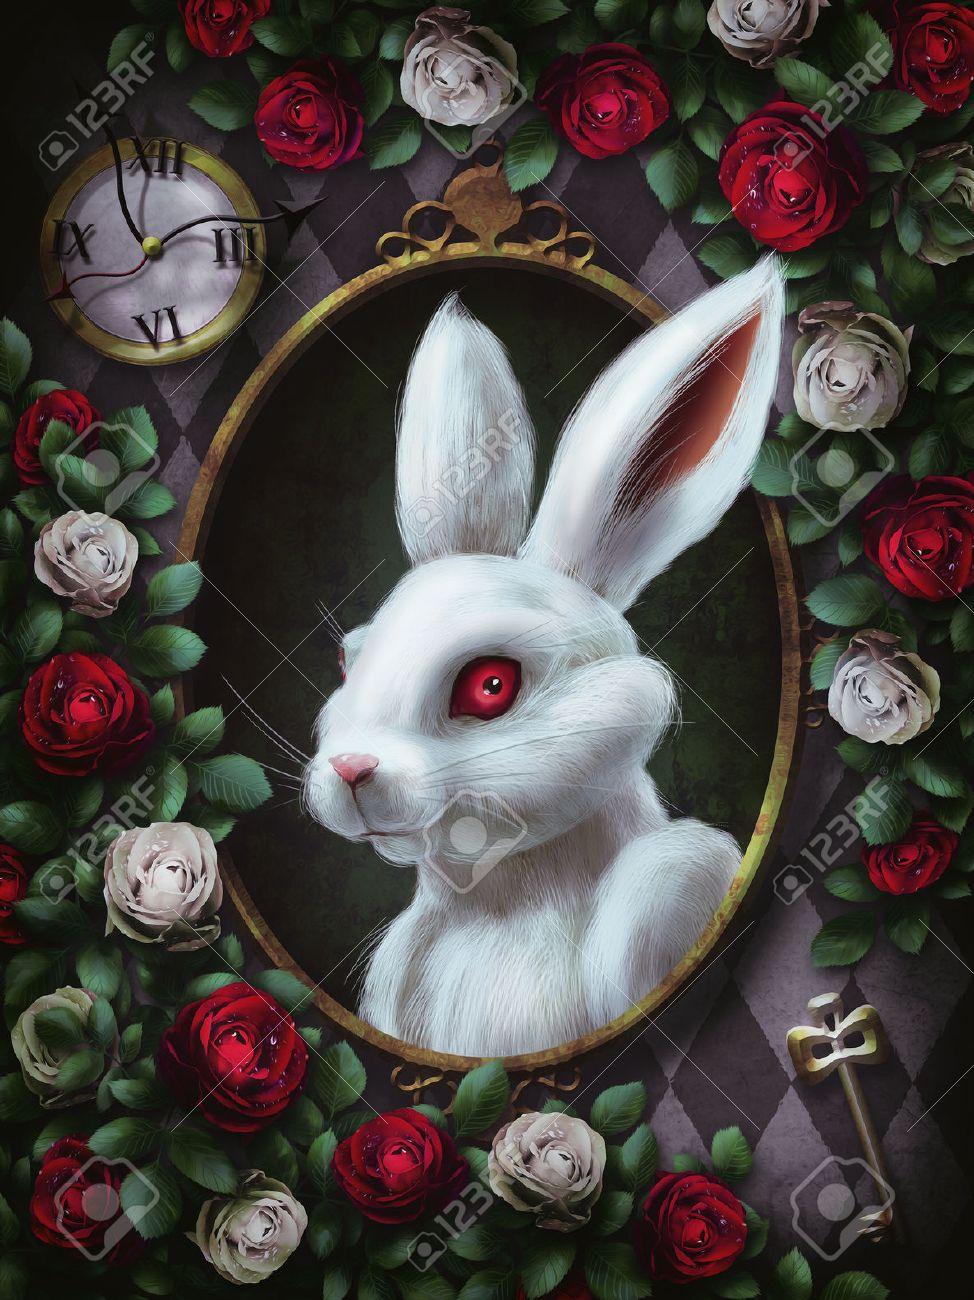 White Rabbit From Alice In Wonderland Portrait In Oval Frame